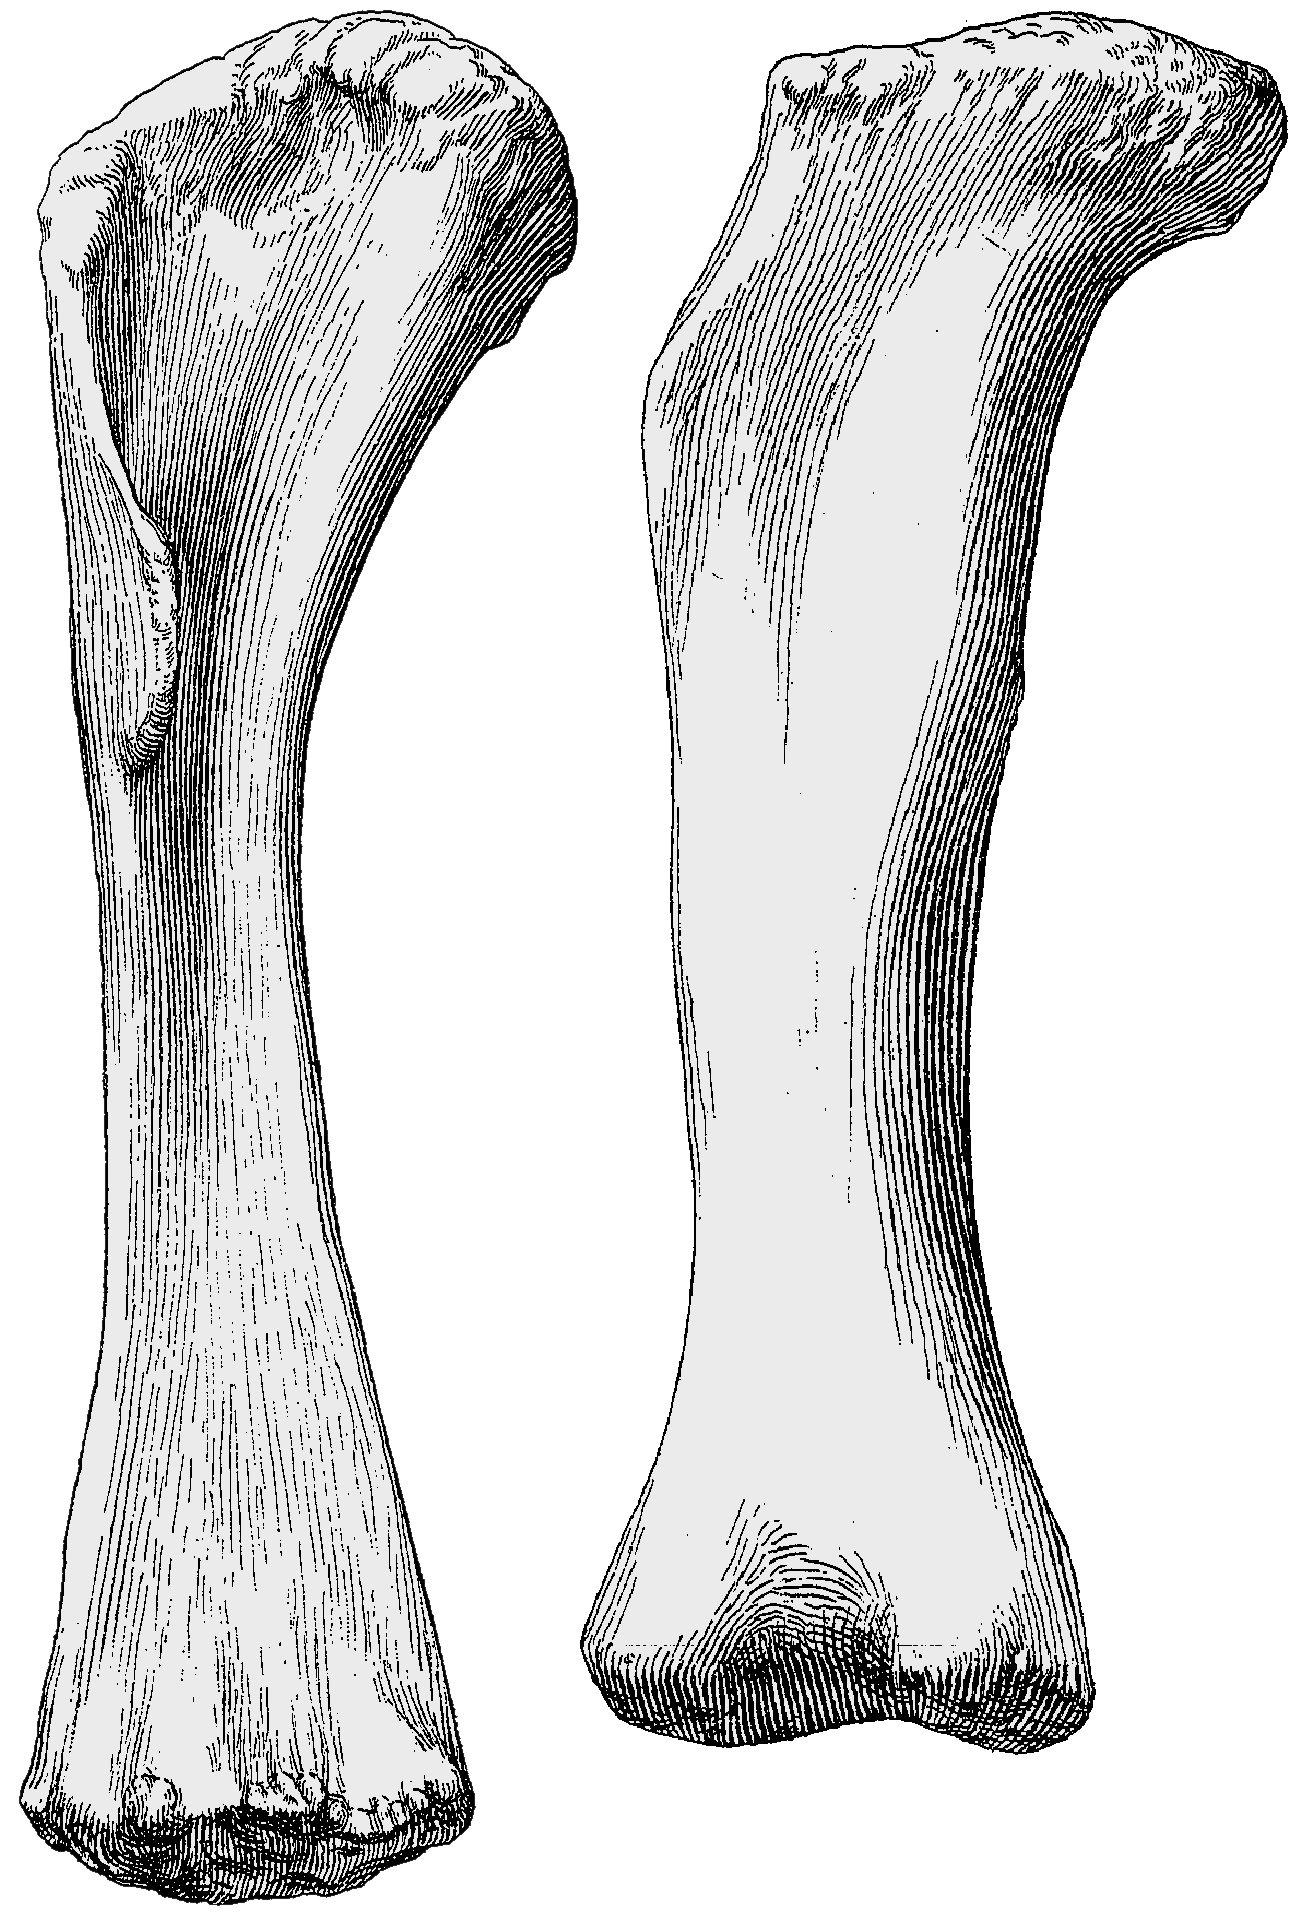 Janensch1961-tendaguru-limbs--plates-AJ--giraffatitan-limb-bones-scaled